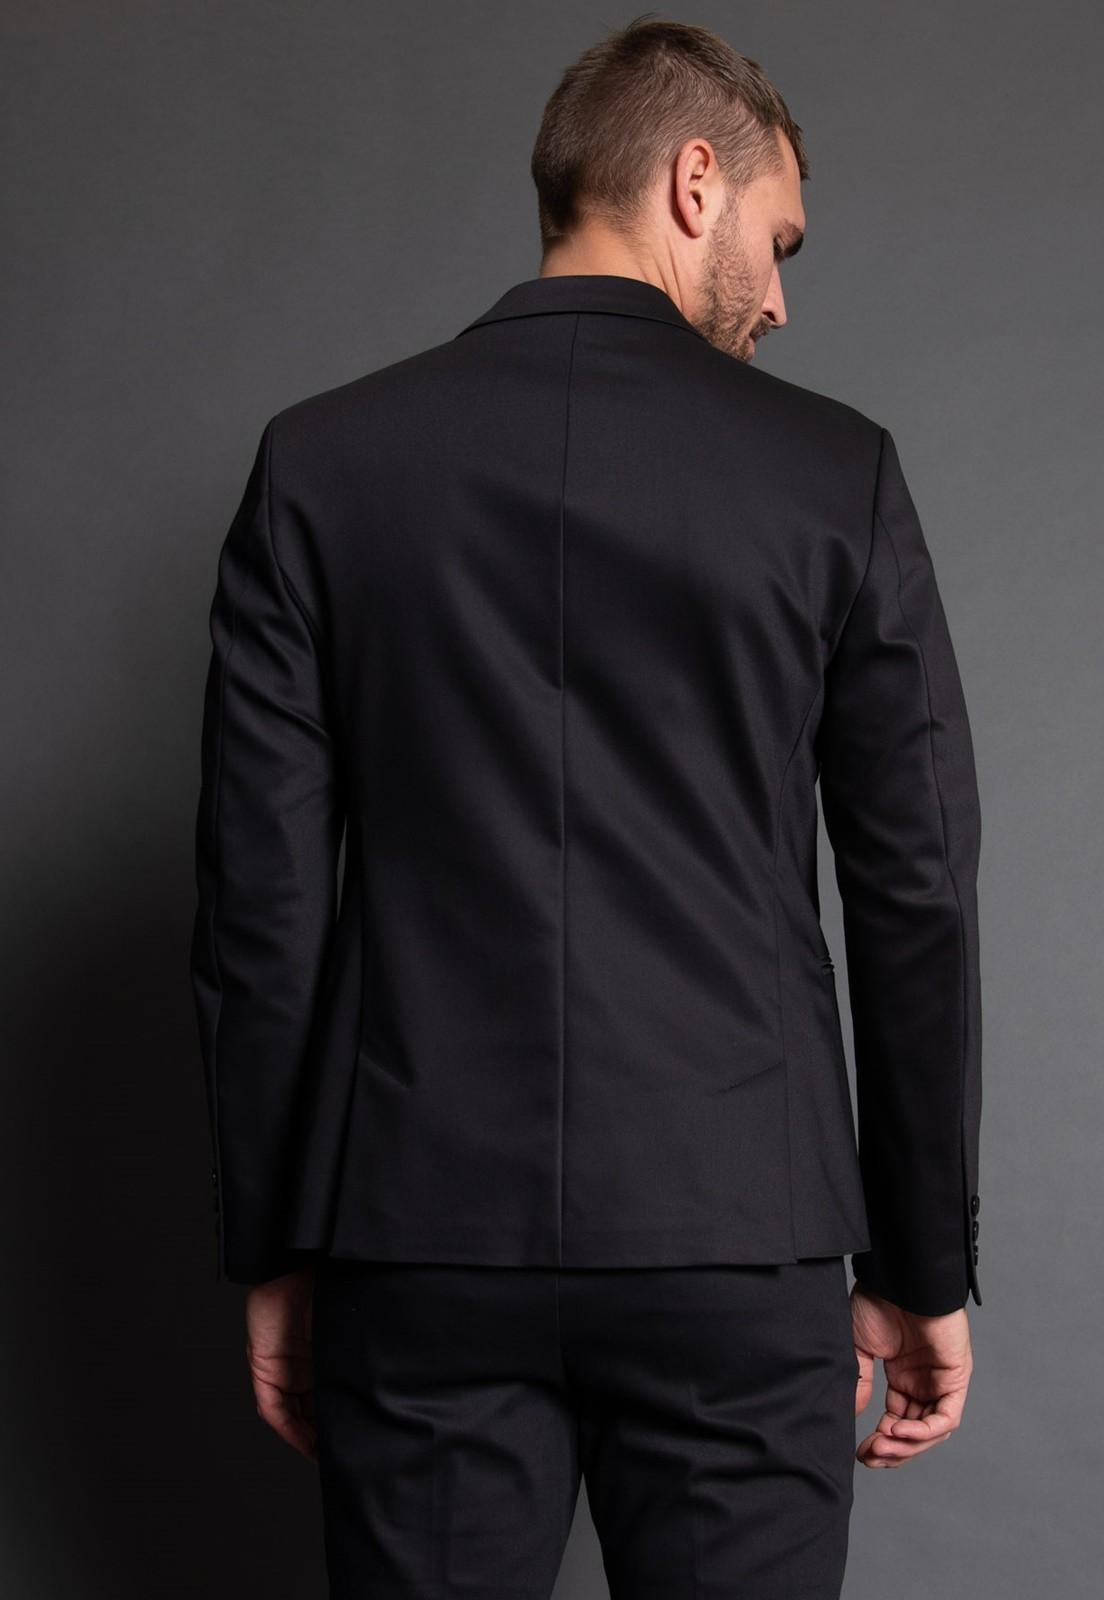 Terno Masculino Jordhan Slim Fit Black Edition